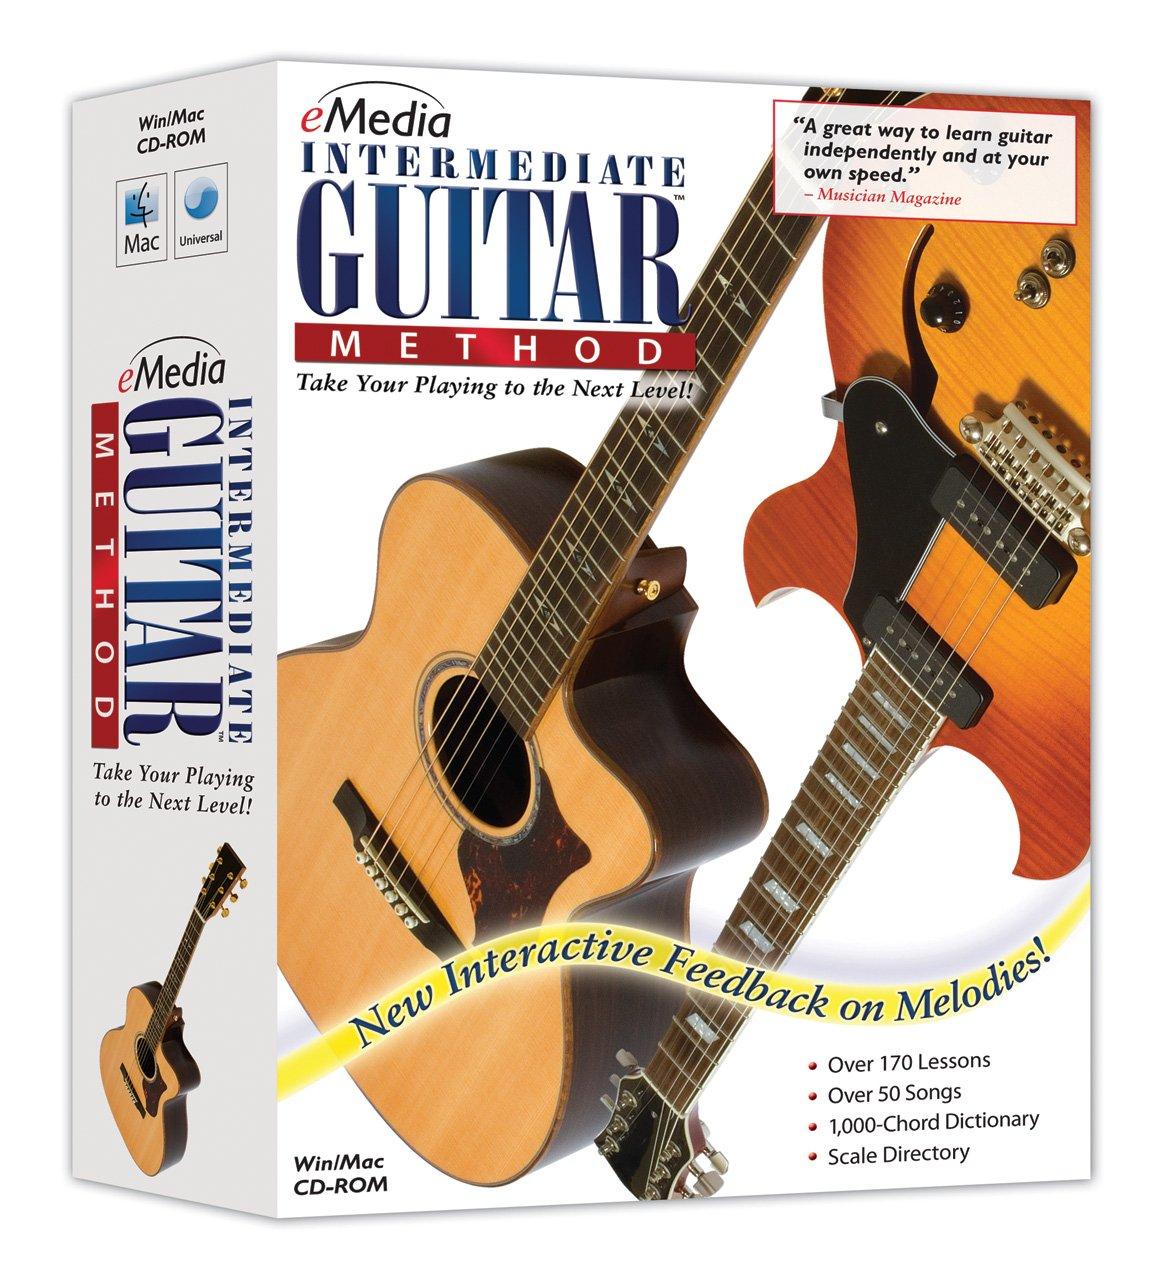 eMedia Intermediate Guitar Method v3